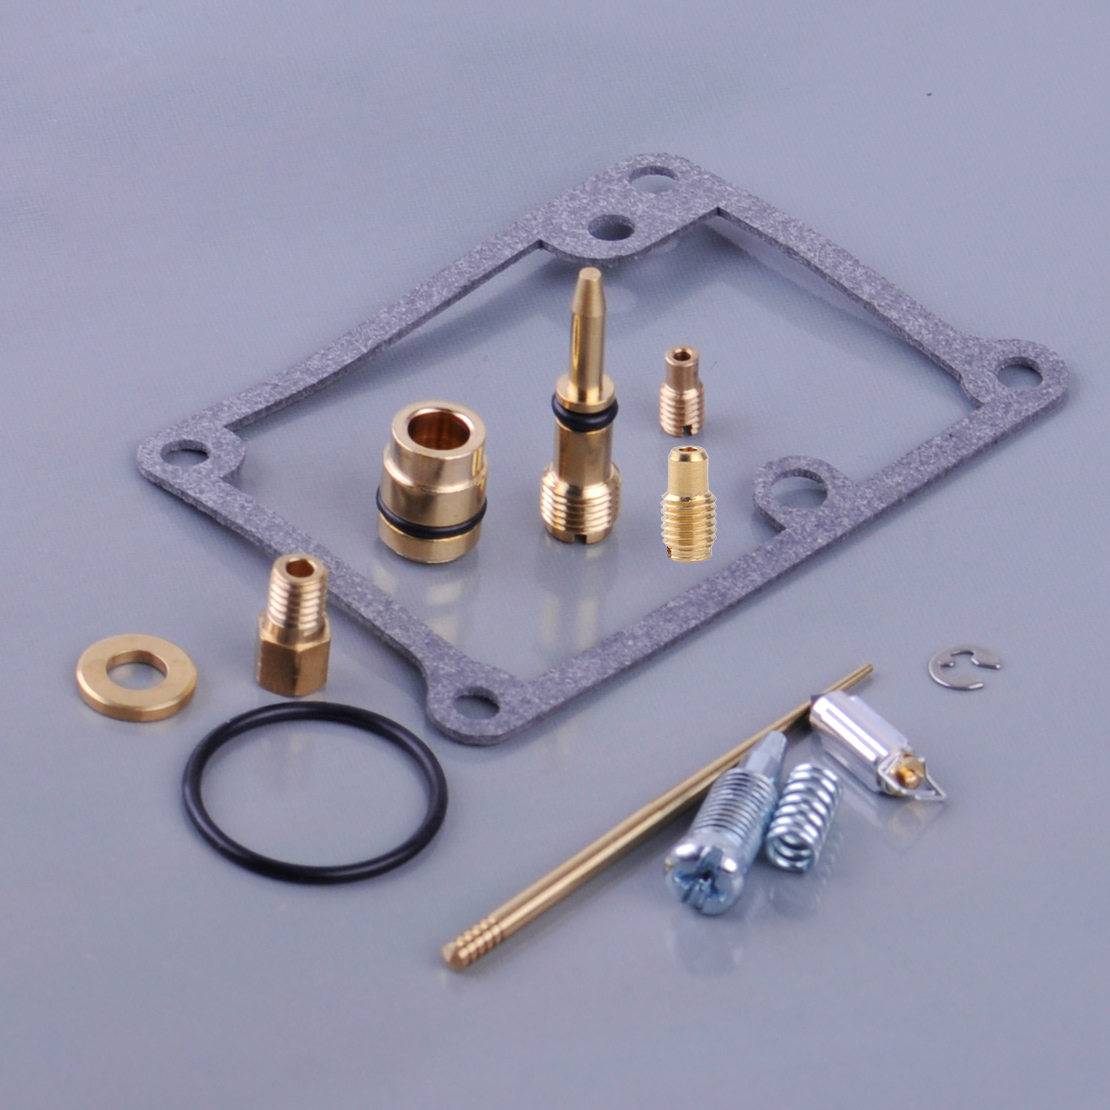 hight resolution of fuel system rebuild kits for yamaha banshee yfz350 carburetor carb rebuild kit repair yfz 350 2